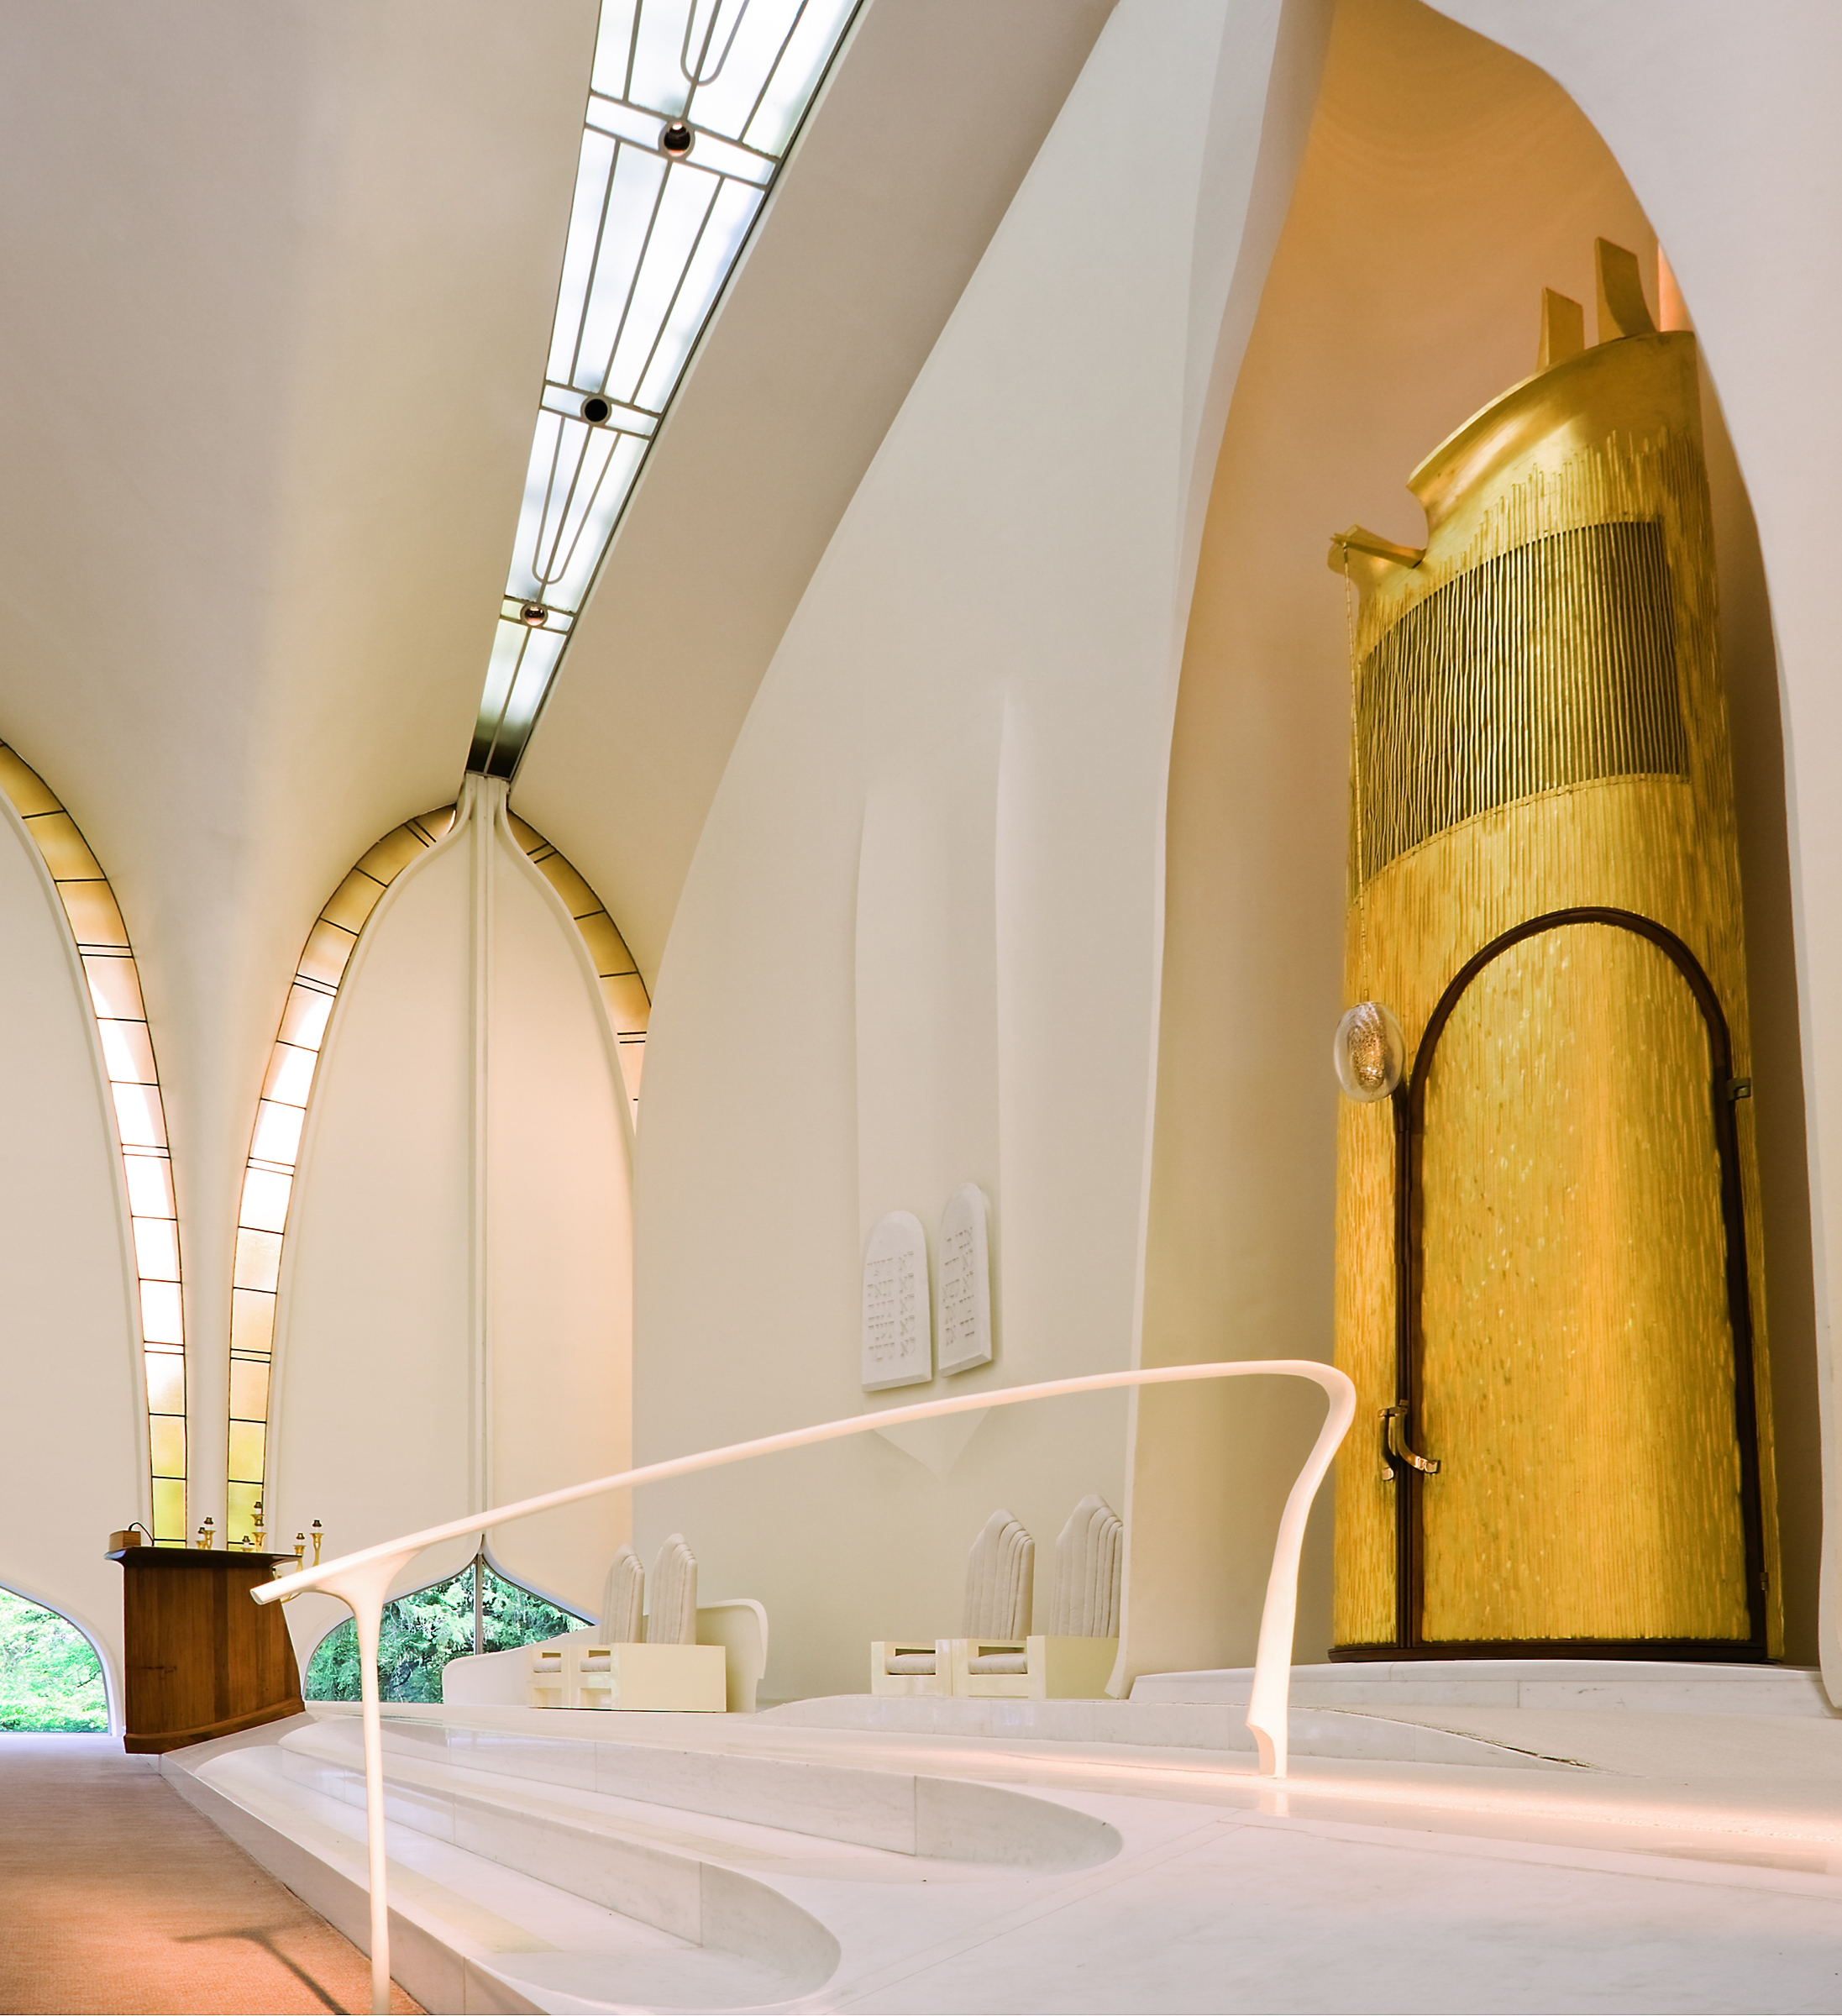 handrails 1.jpg